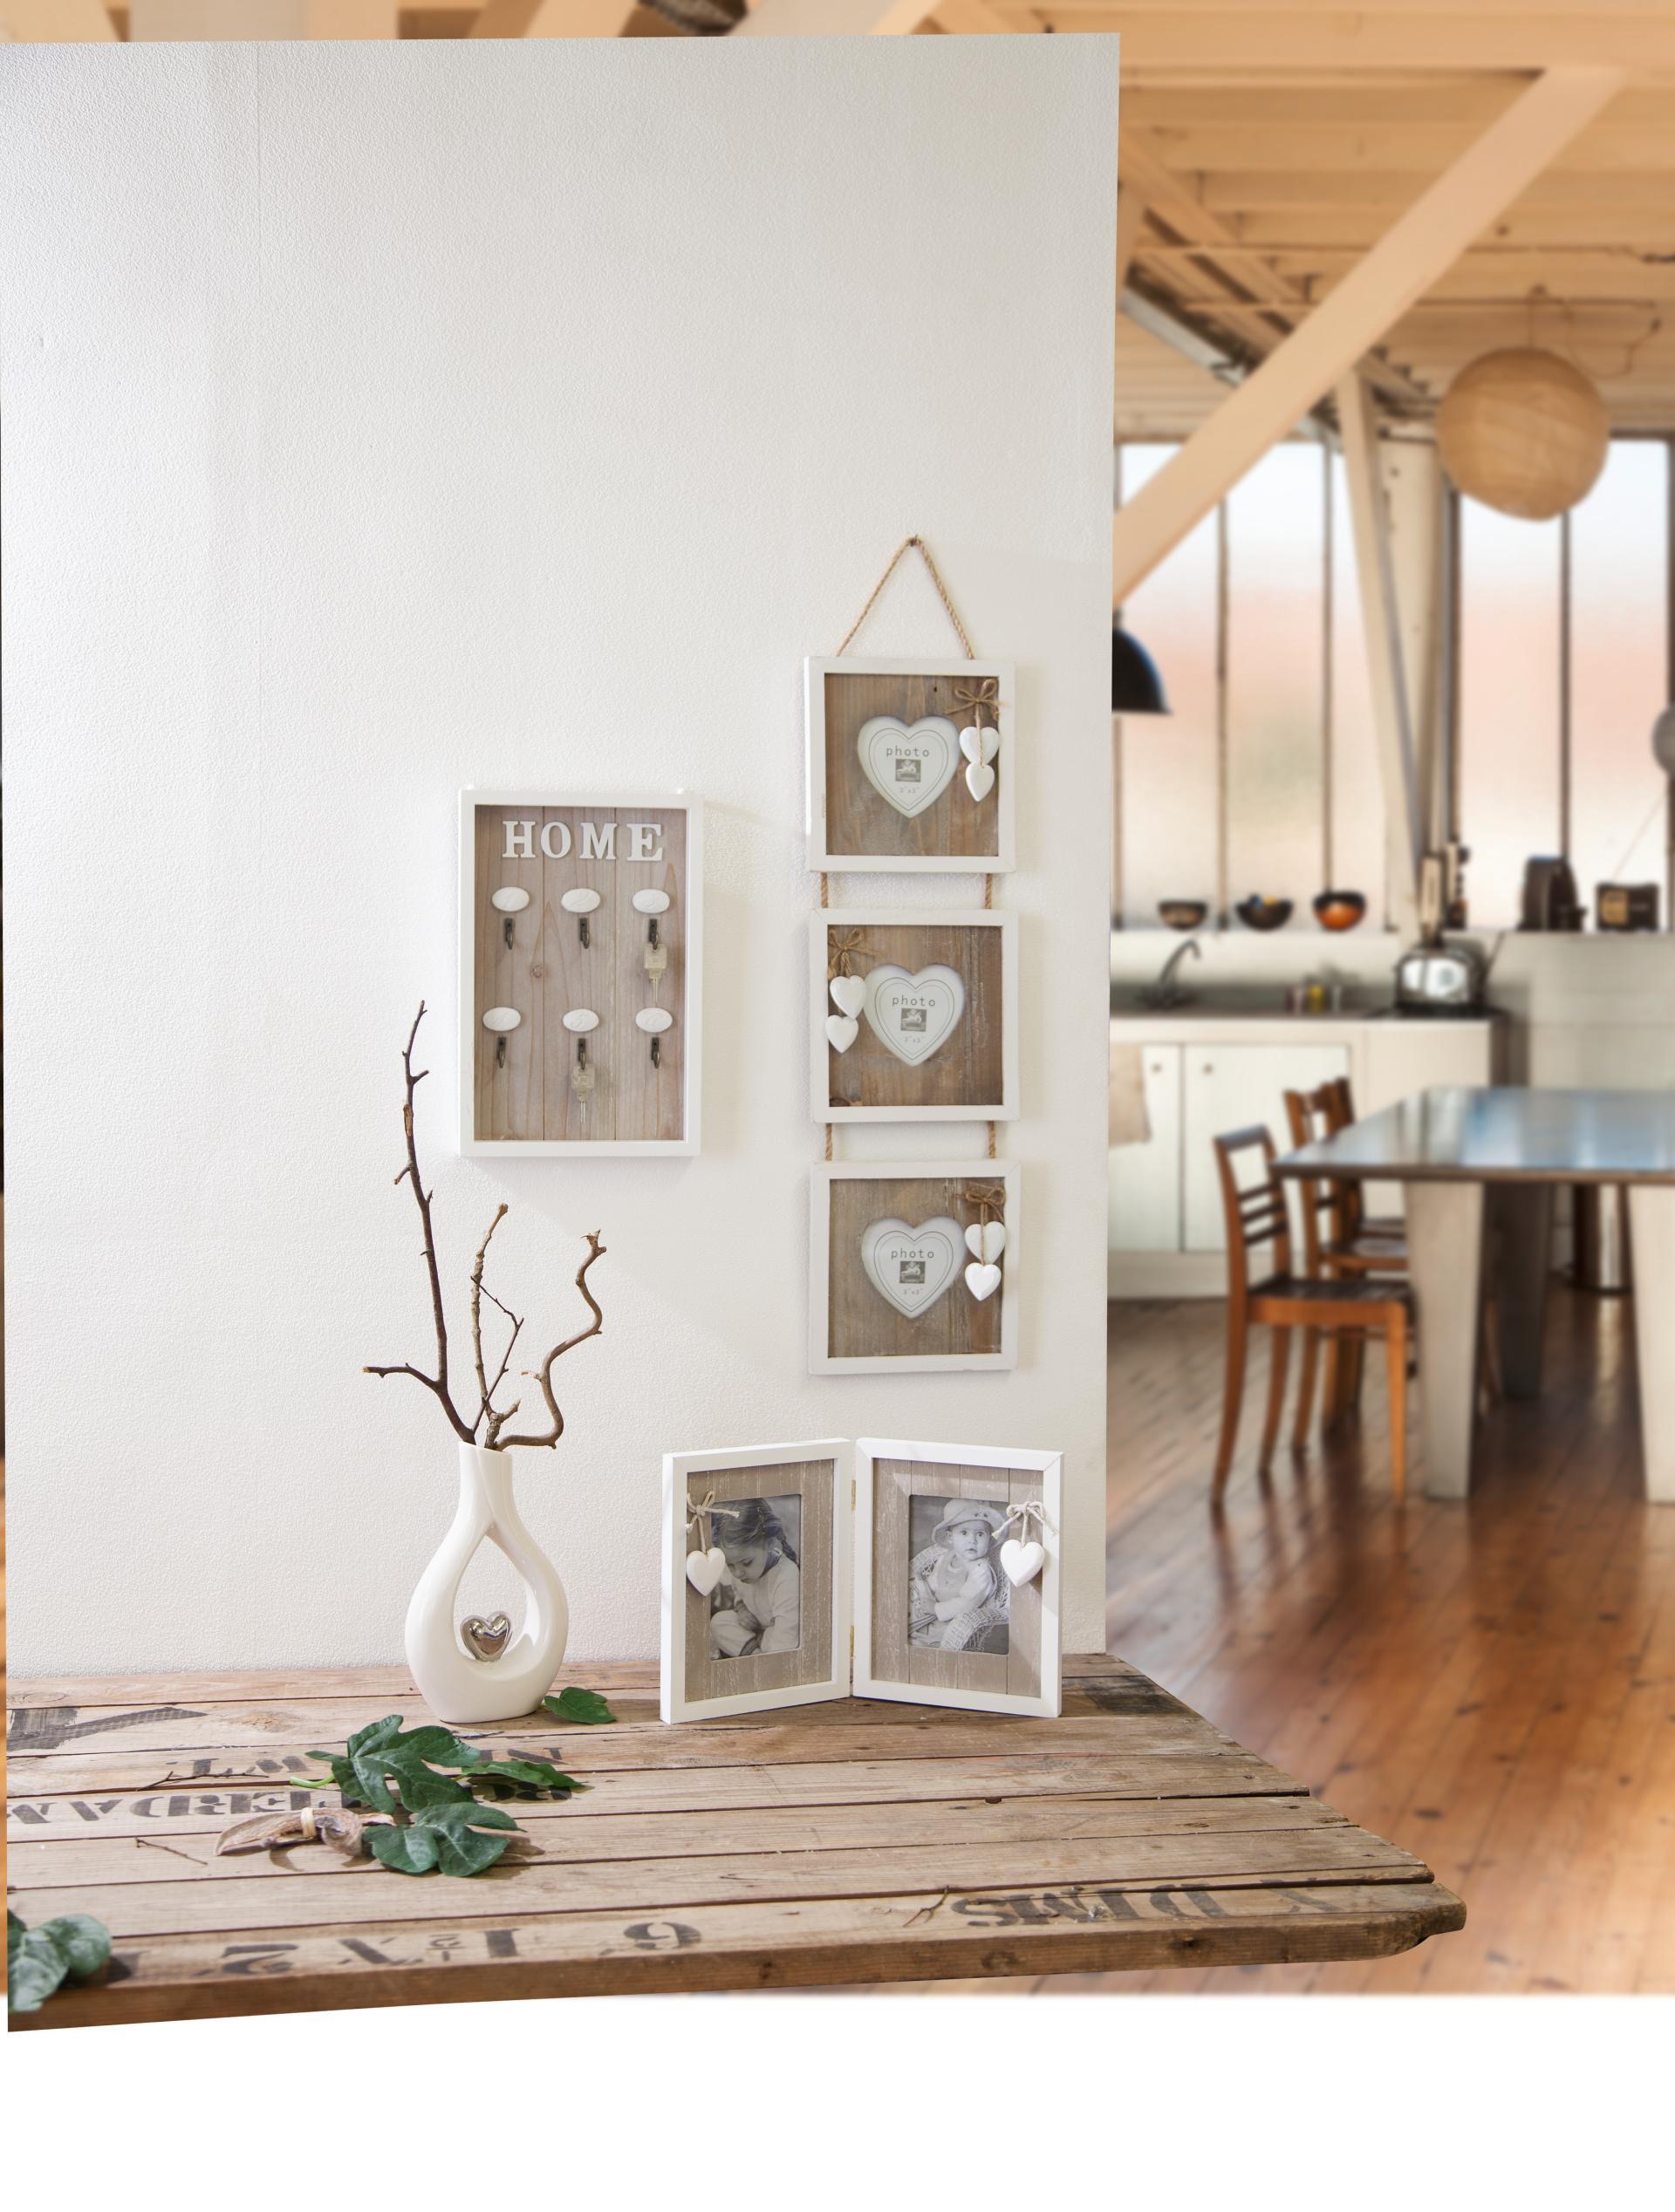 h nge bilderrahmen f r 3 fotos 7 5x7 5 cm aus holz 18x2x70 cm g nstig online kaufen. Black Bedroom Furniture Sets. Home Design Ideas